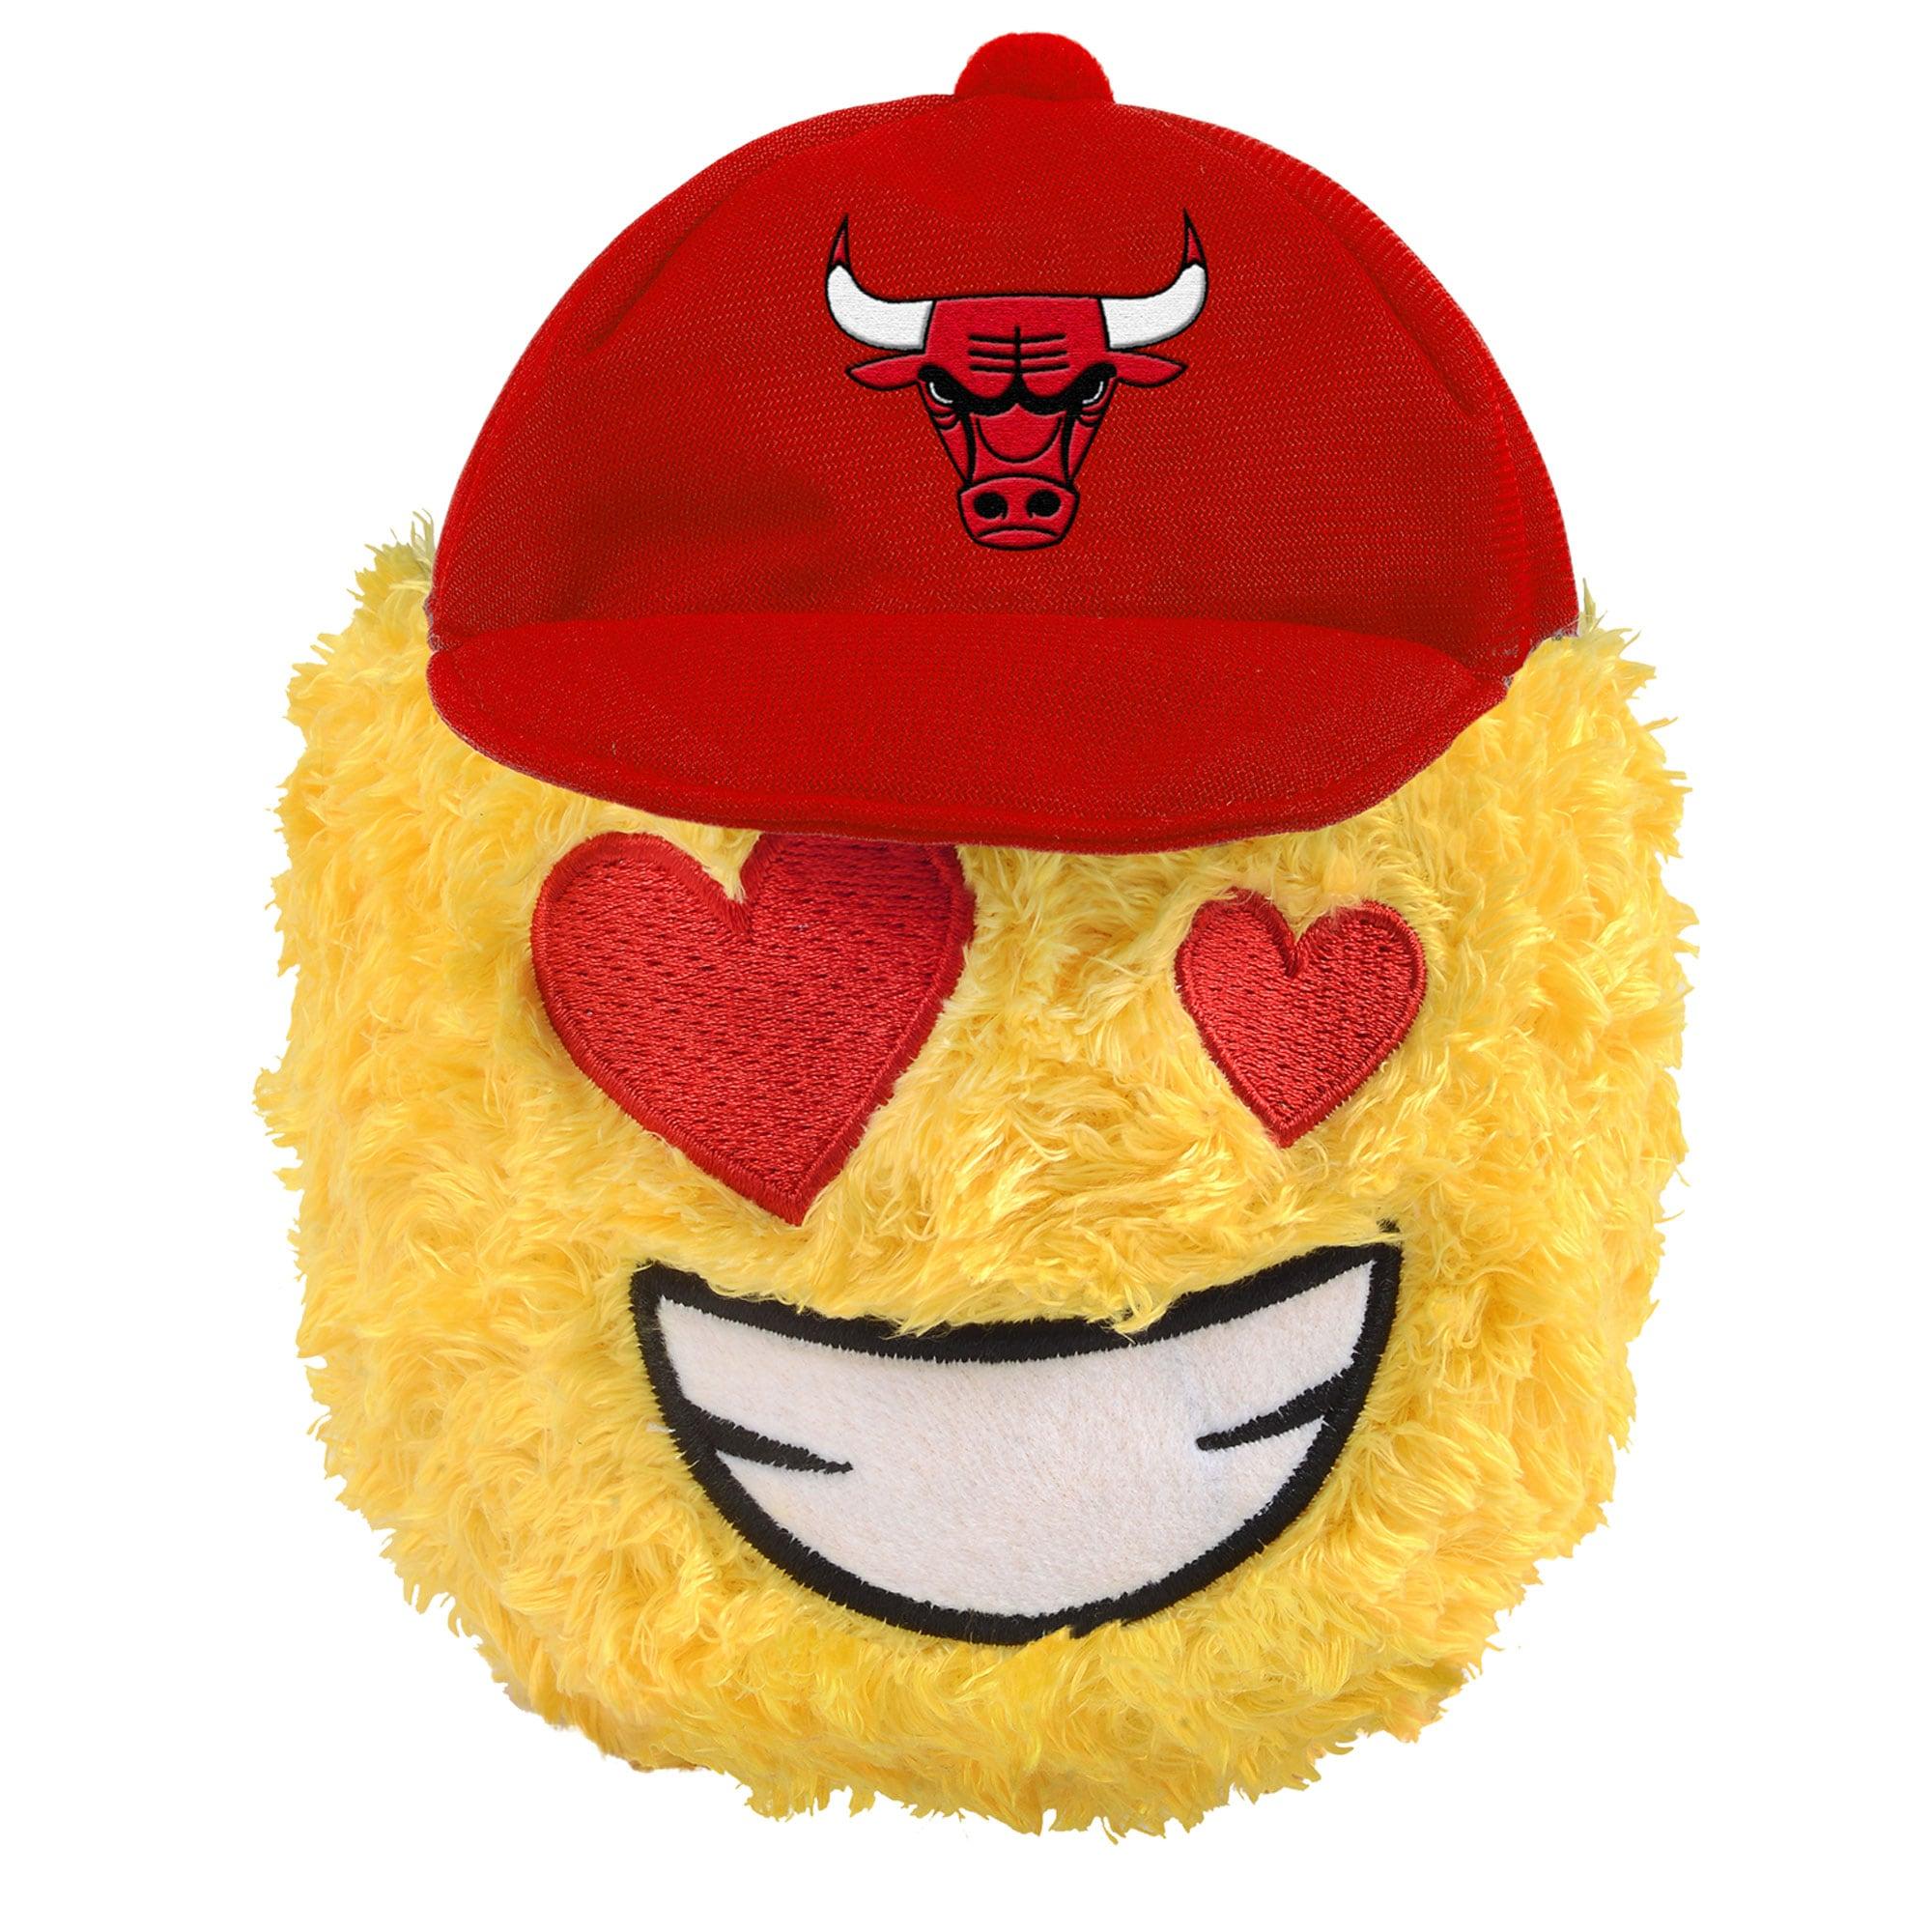 "Chicago Bulls 5"" Heart Eyes Teamoji Plush Toy"